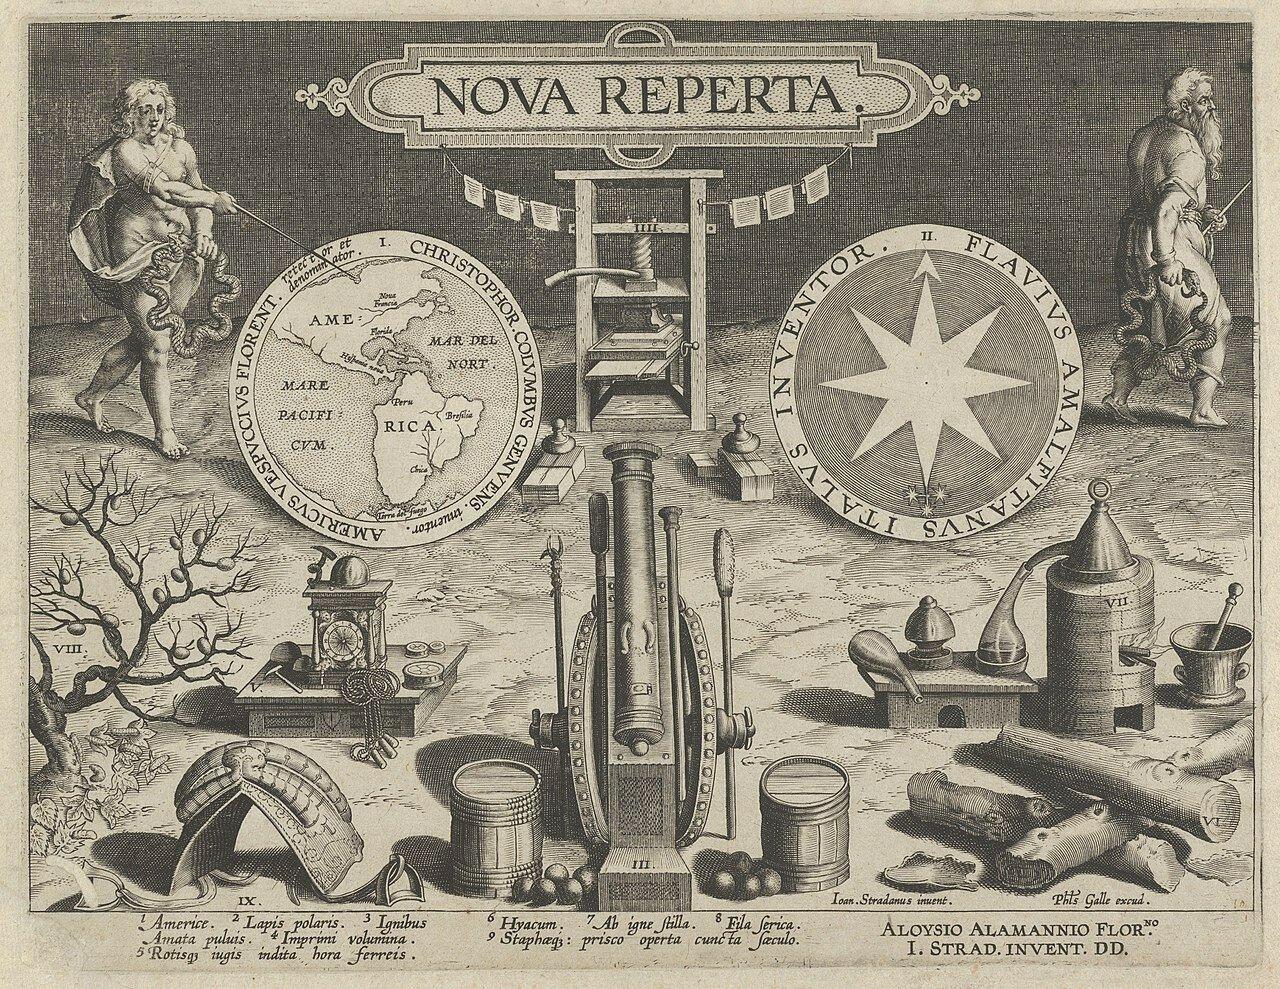 1280px-New_Inventions_of_Modern_Times_-Nova_Reperta-,_Title_Plate_MET_DP841122.jpg